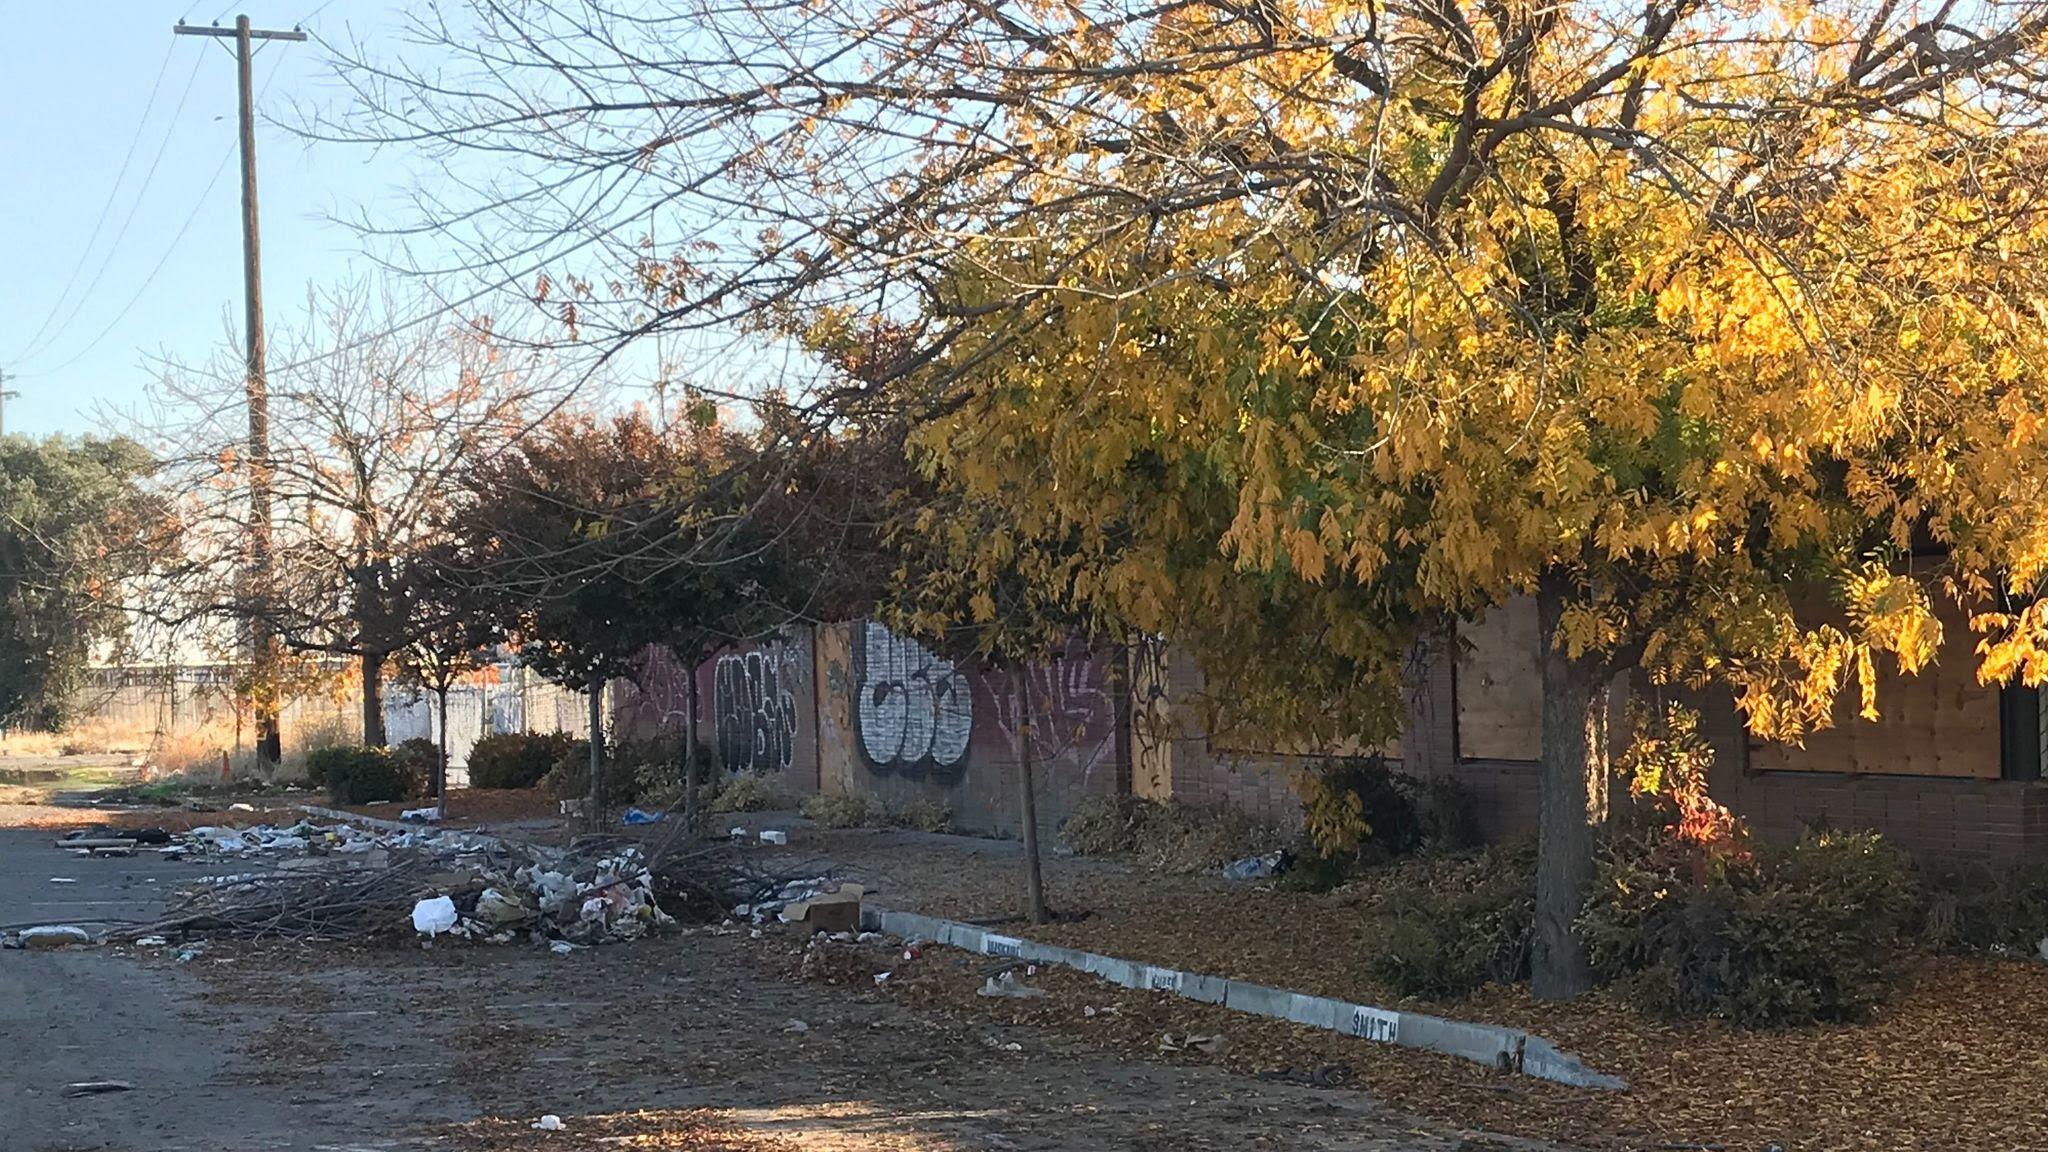 A rail property is strewn with trash in Fresno.